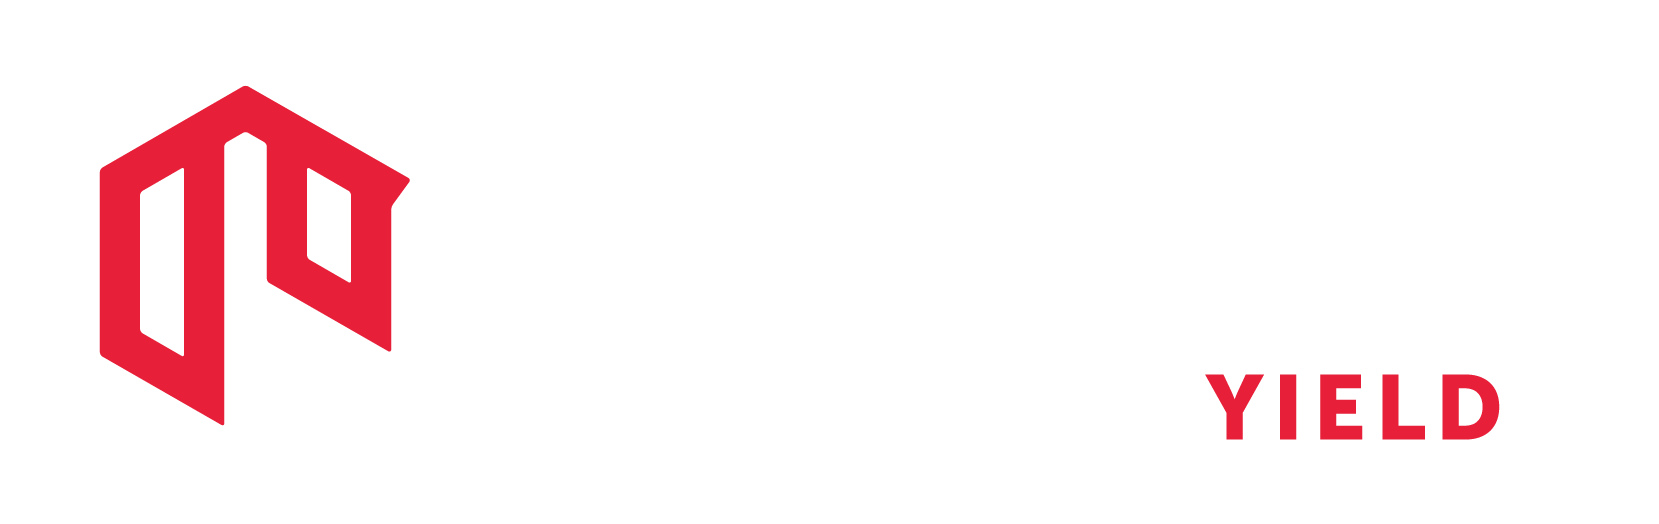 Relevant_yield_logo